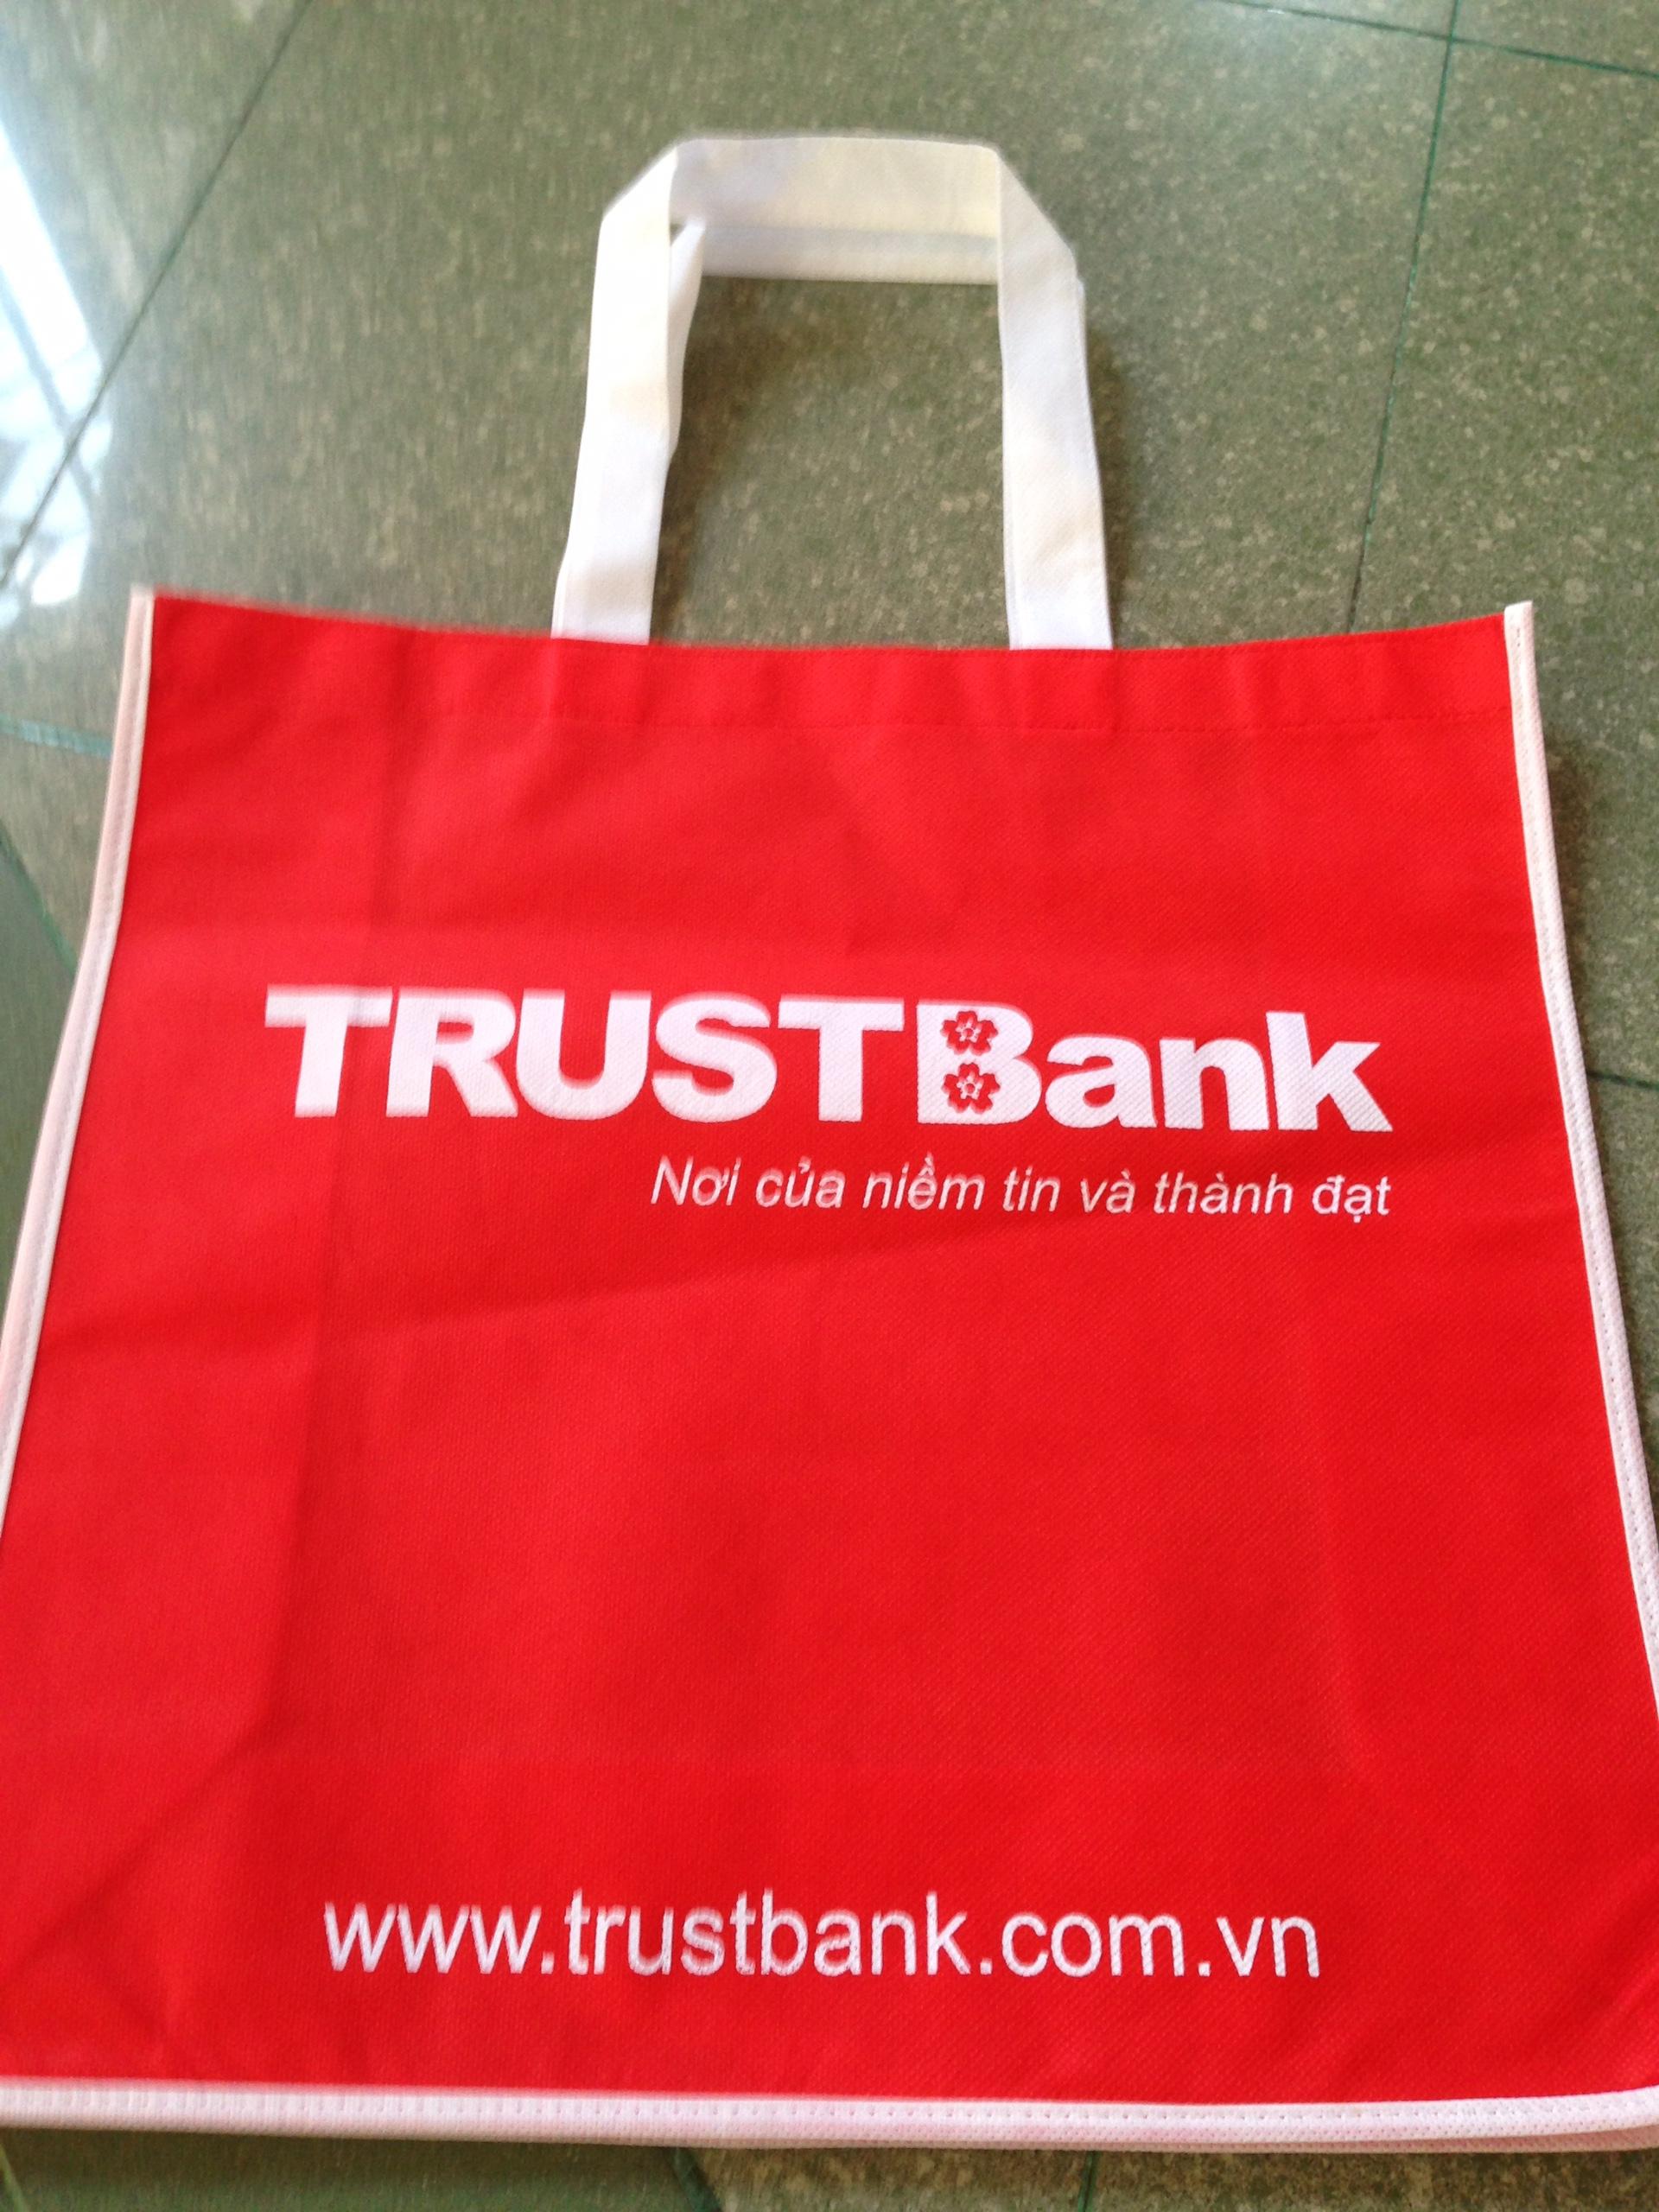 tui-vai-khong-det-mau-trustbank